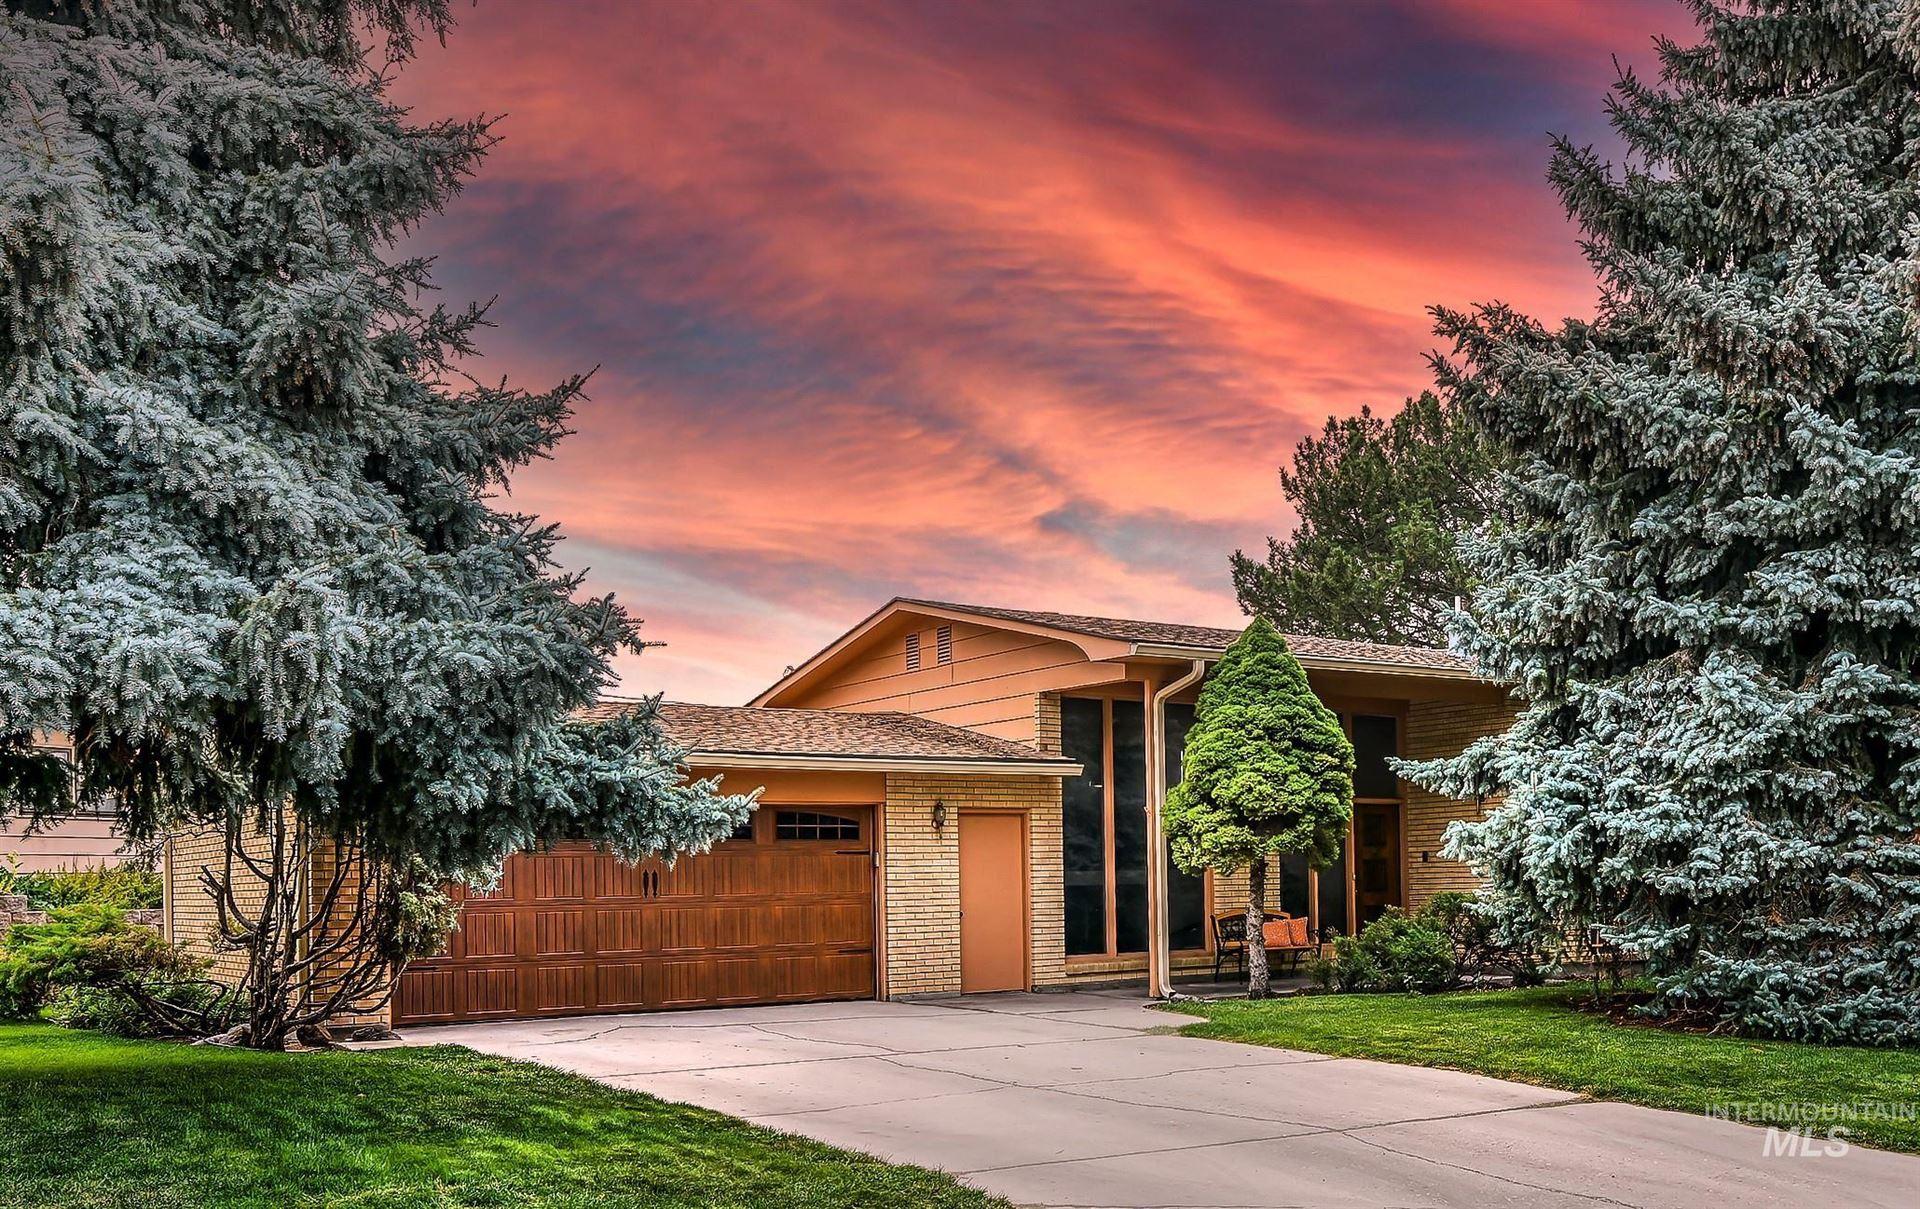 421 E Highland View Drive, Boise, ID 83702 - MLS#: 98820451